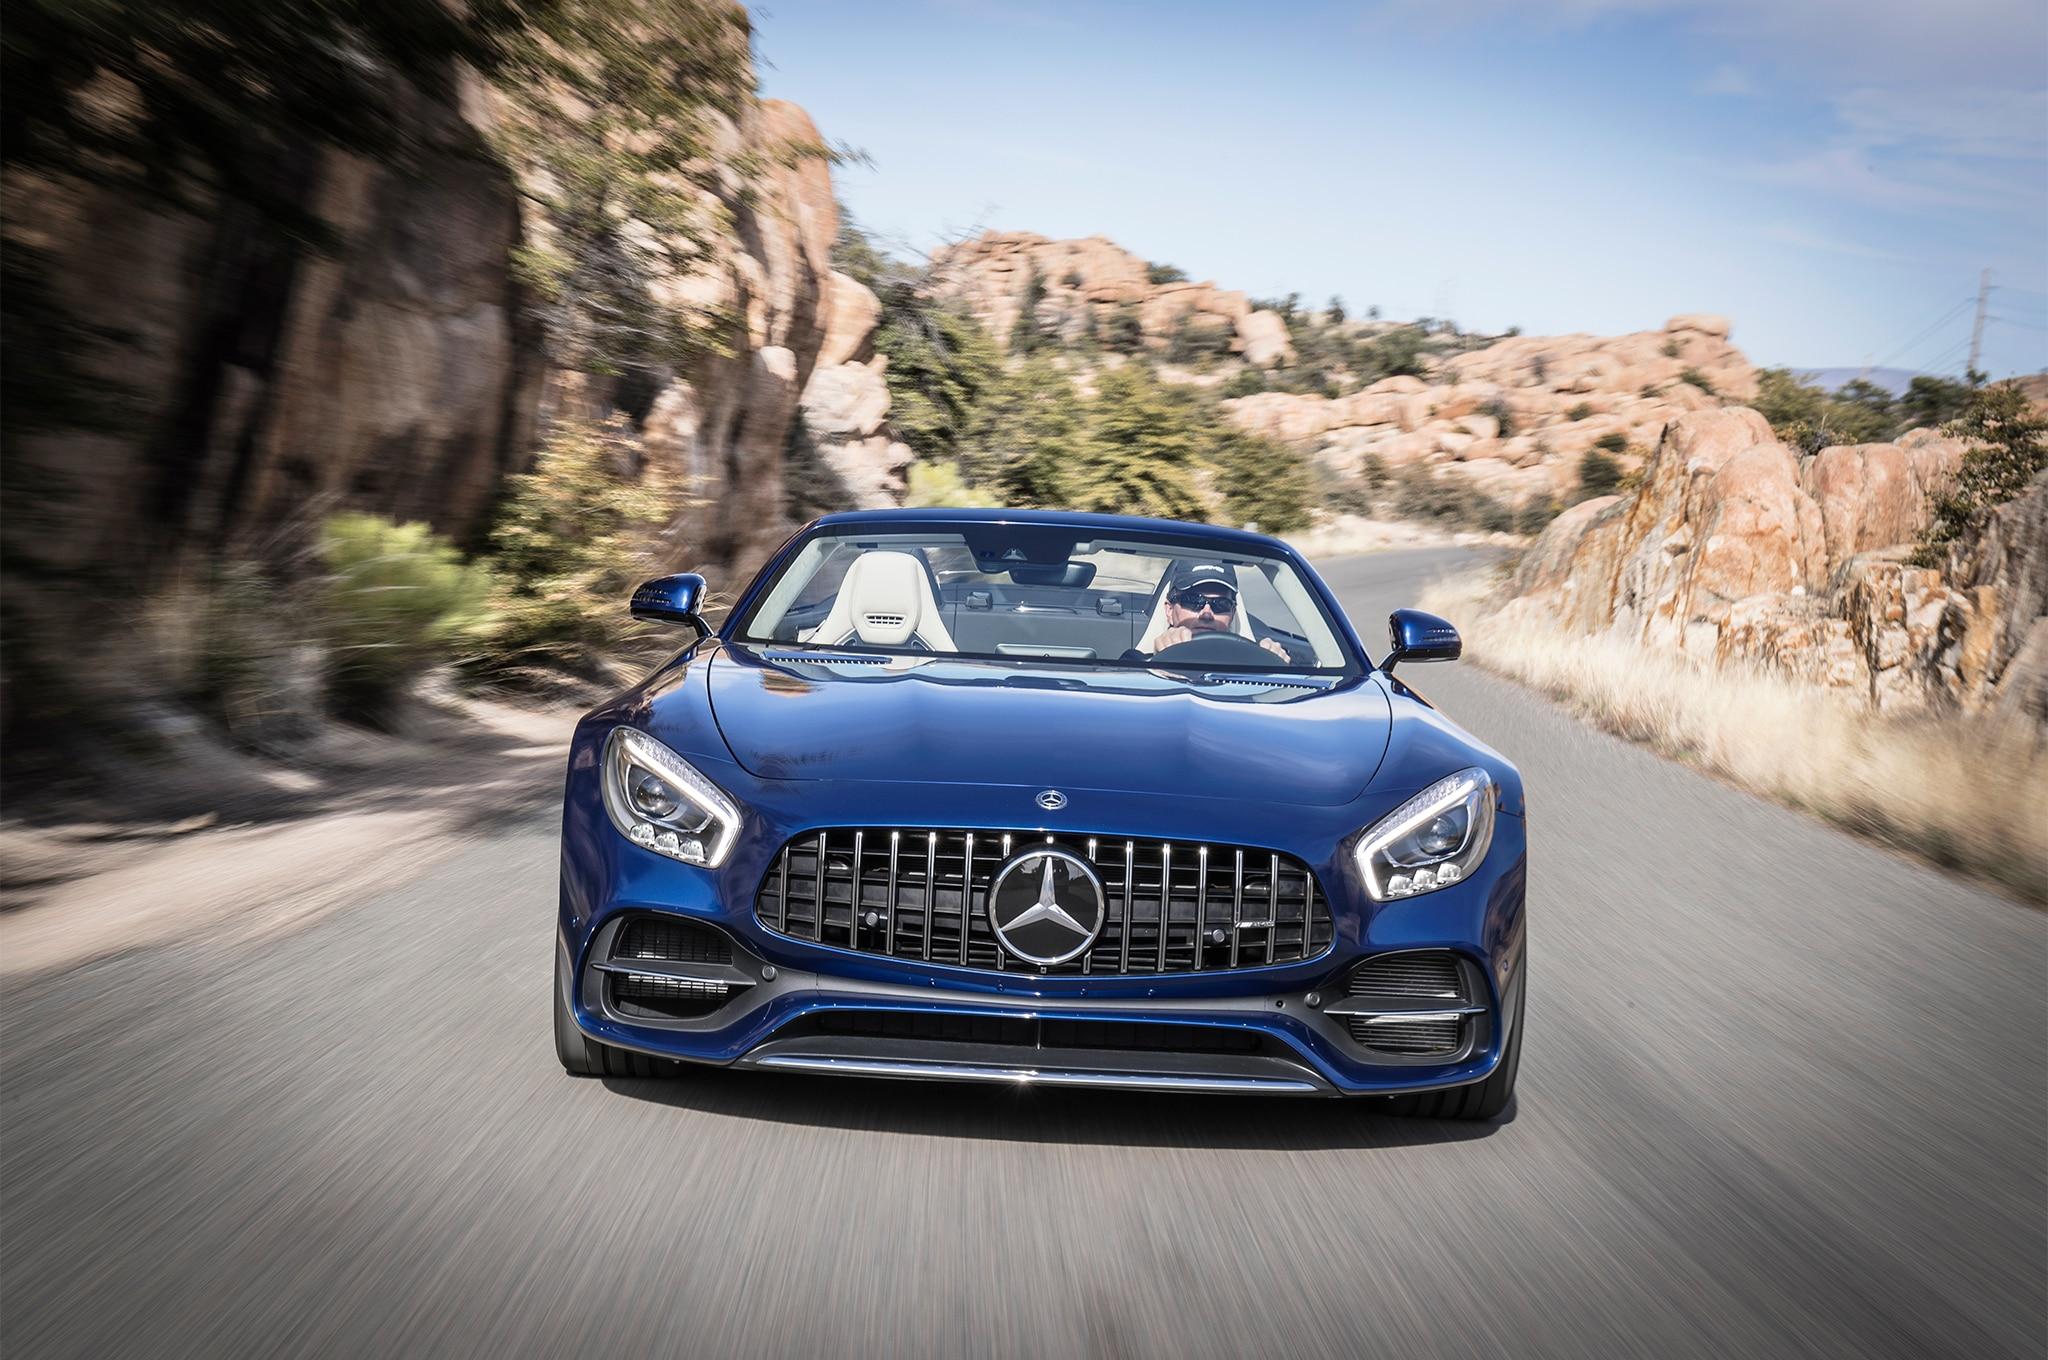 2018 Mercedes AMG GT Roadster Front End In Motion